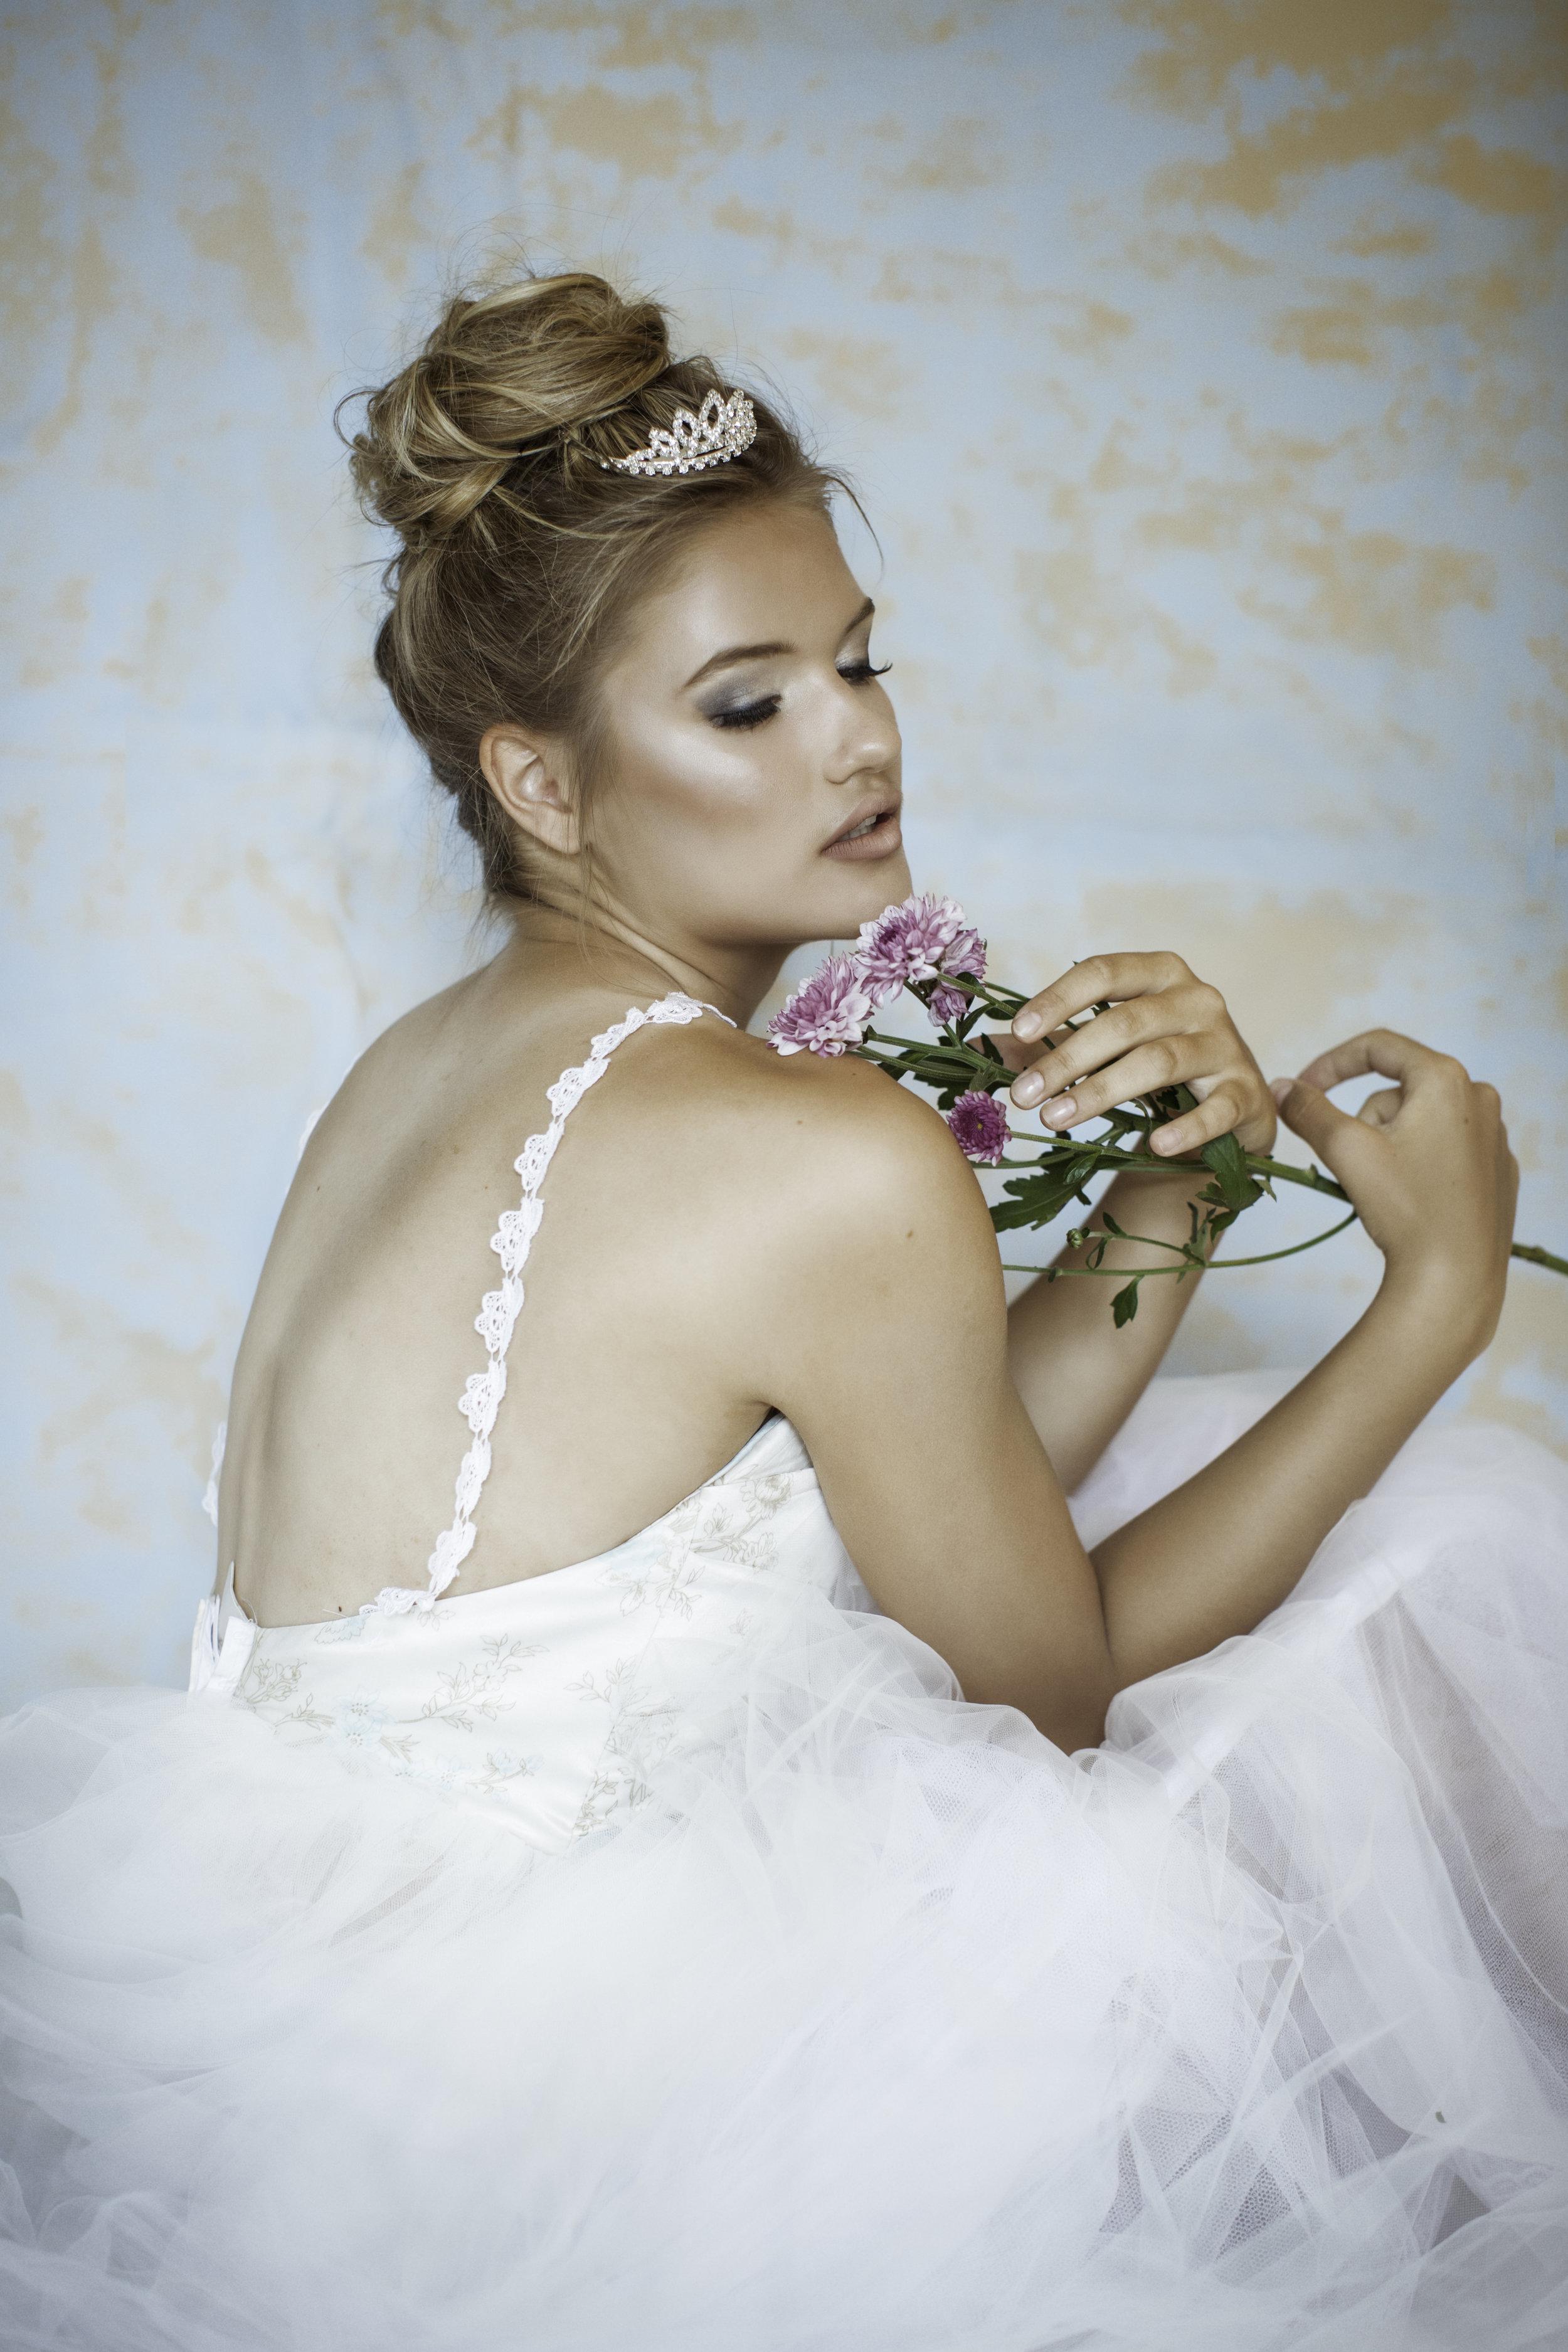 Model: Elizabeth Varga   Makeup Artist/Hairstylist: Jennifer Gjertsen of Jack'd Up Beauty Boutique